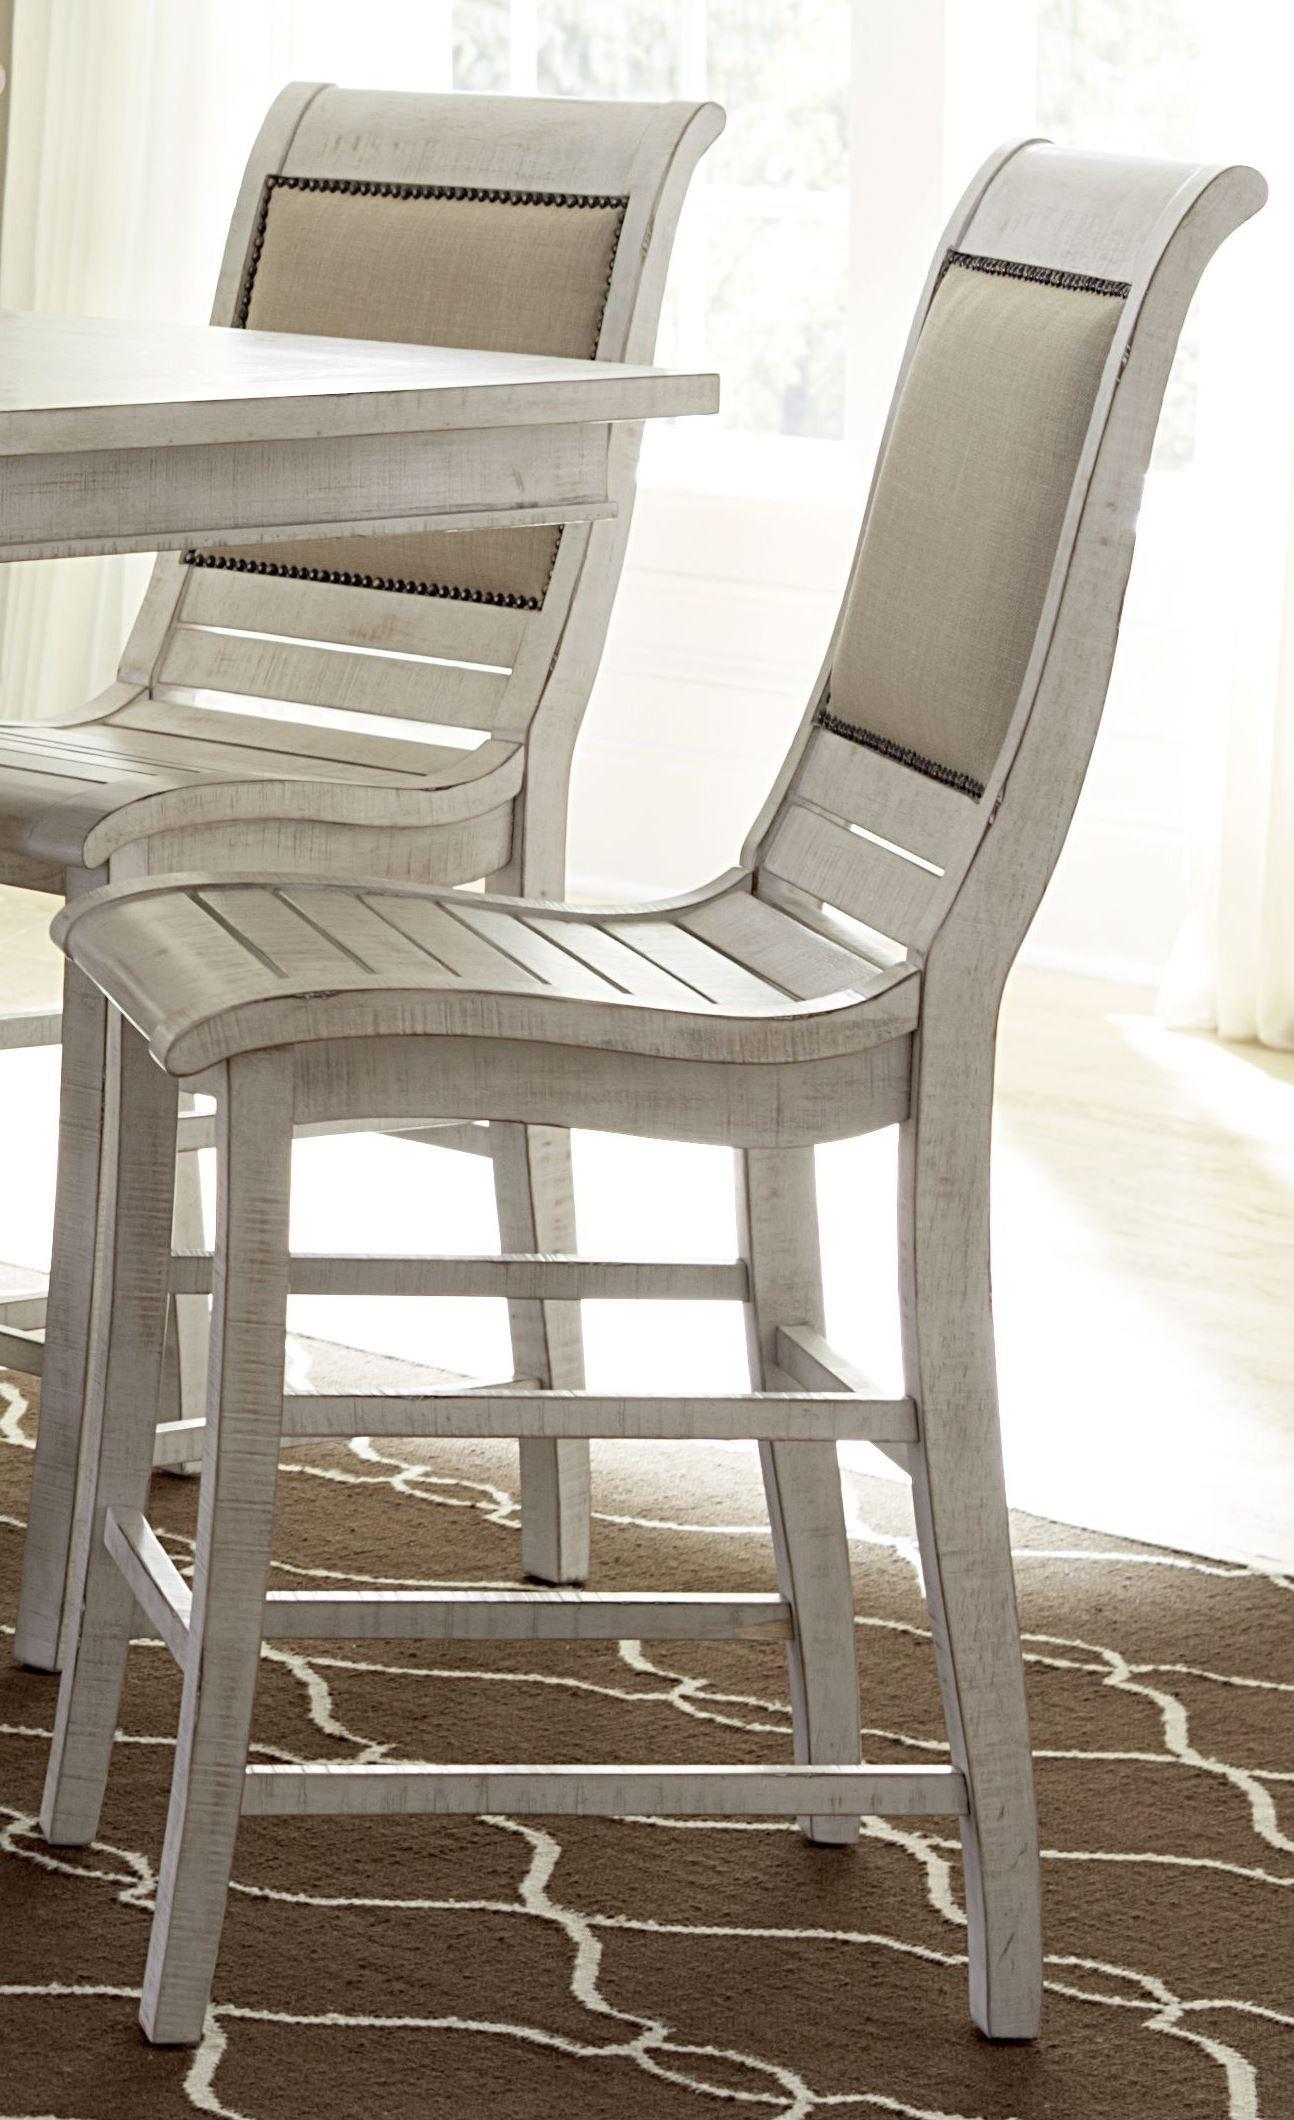 Willow Distressed White Slat Bedroom Set: Willow Distressed White Counter Upholstered Chair Set Of 2